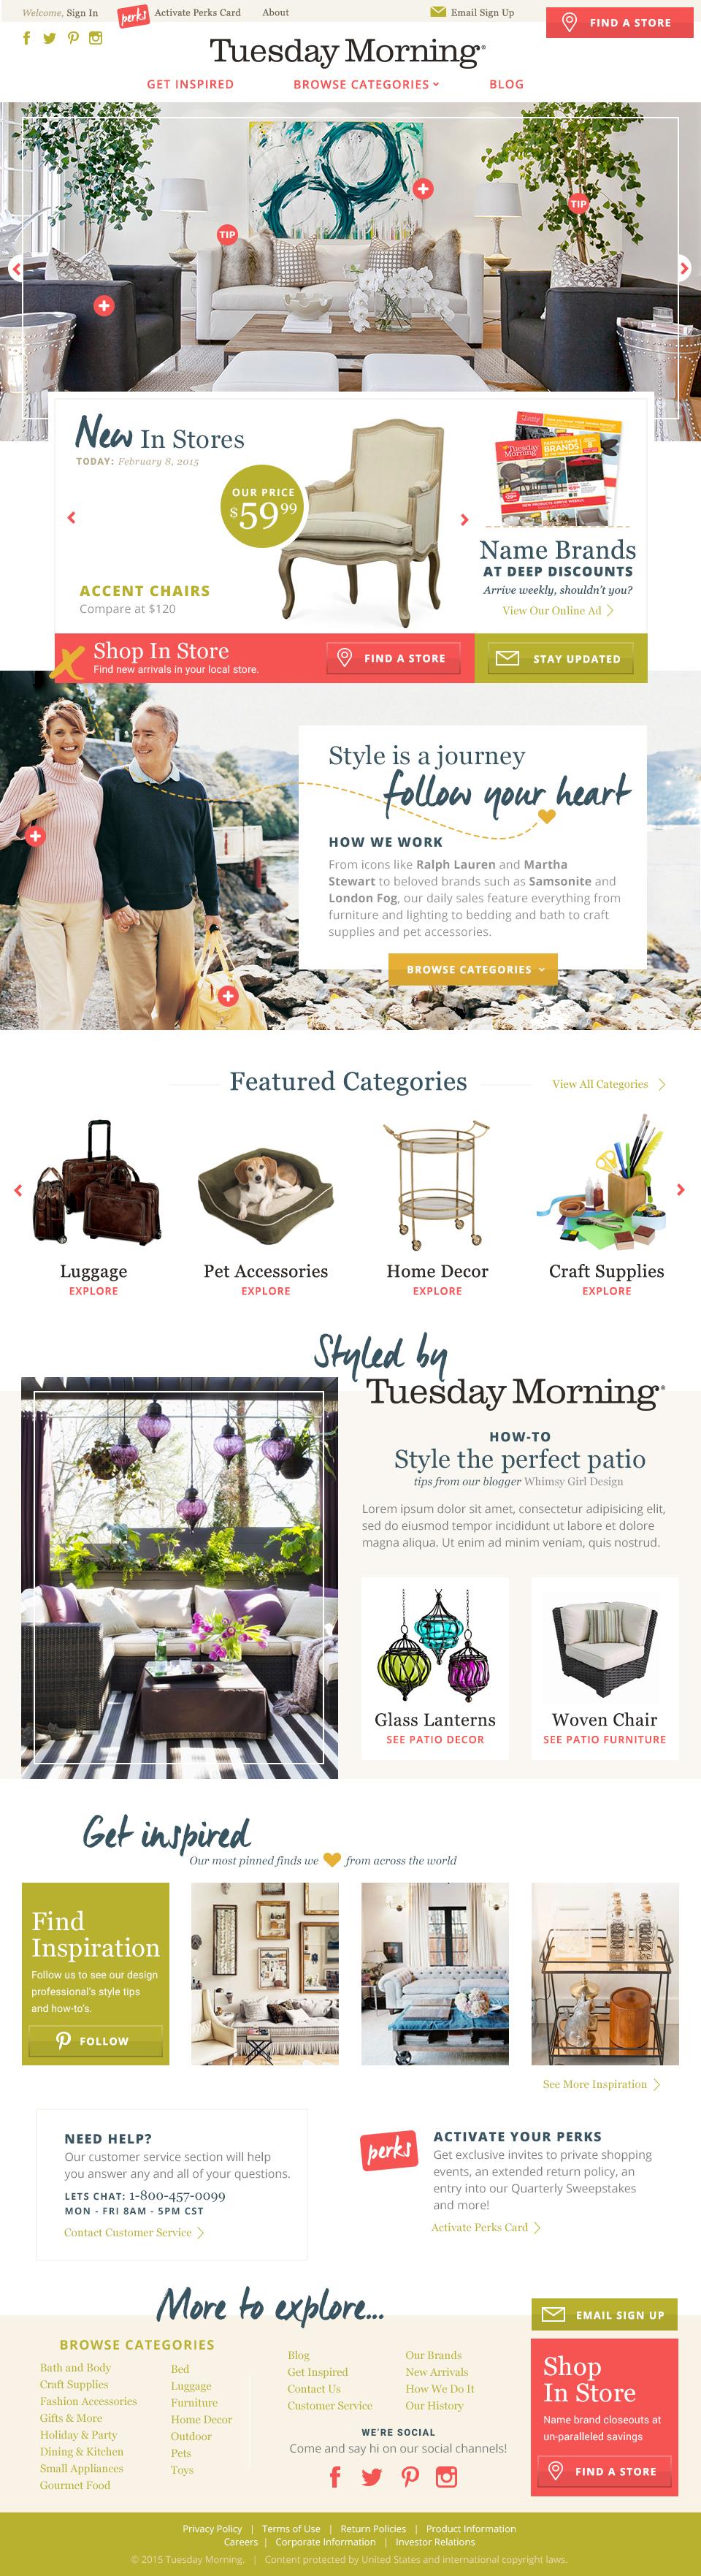 Tuesday-morning-home-design